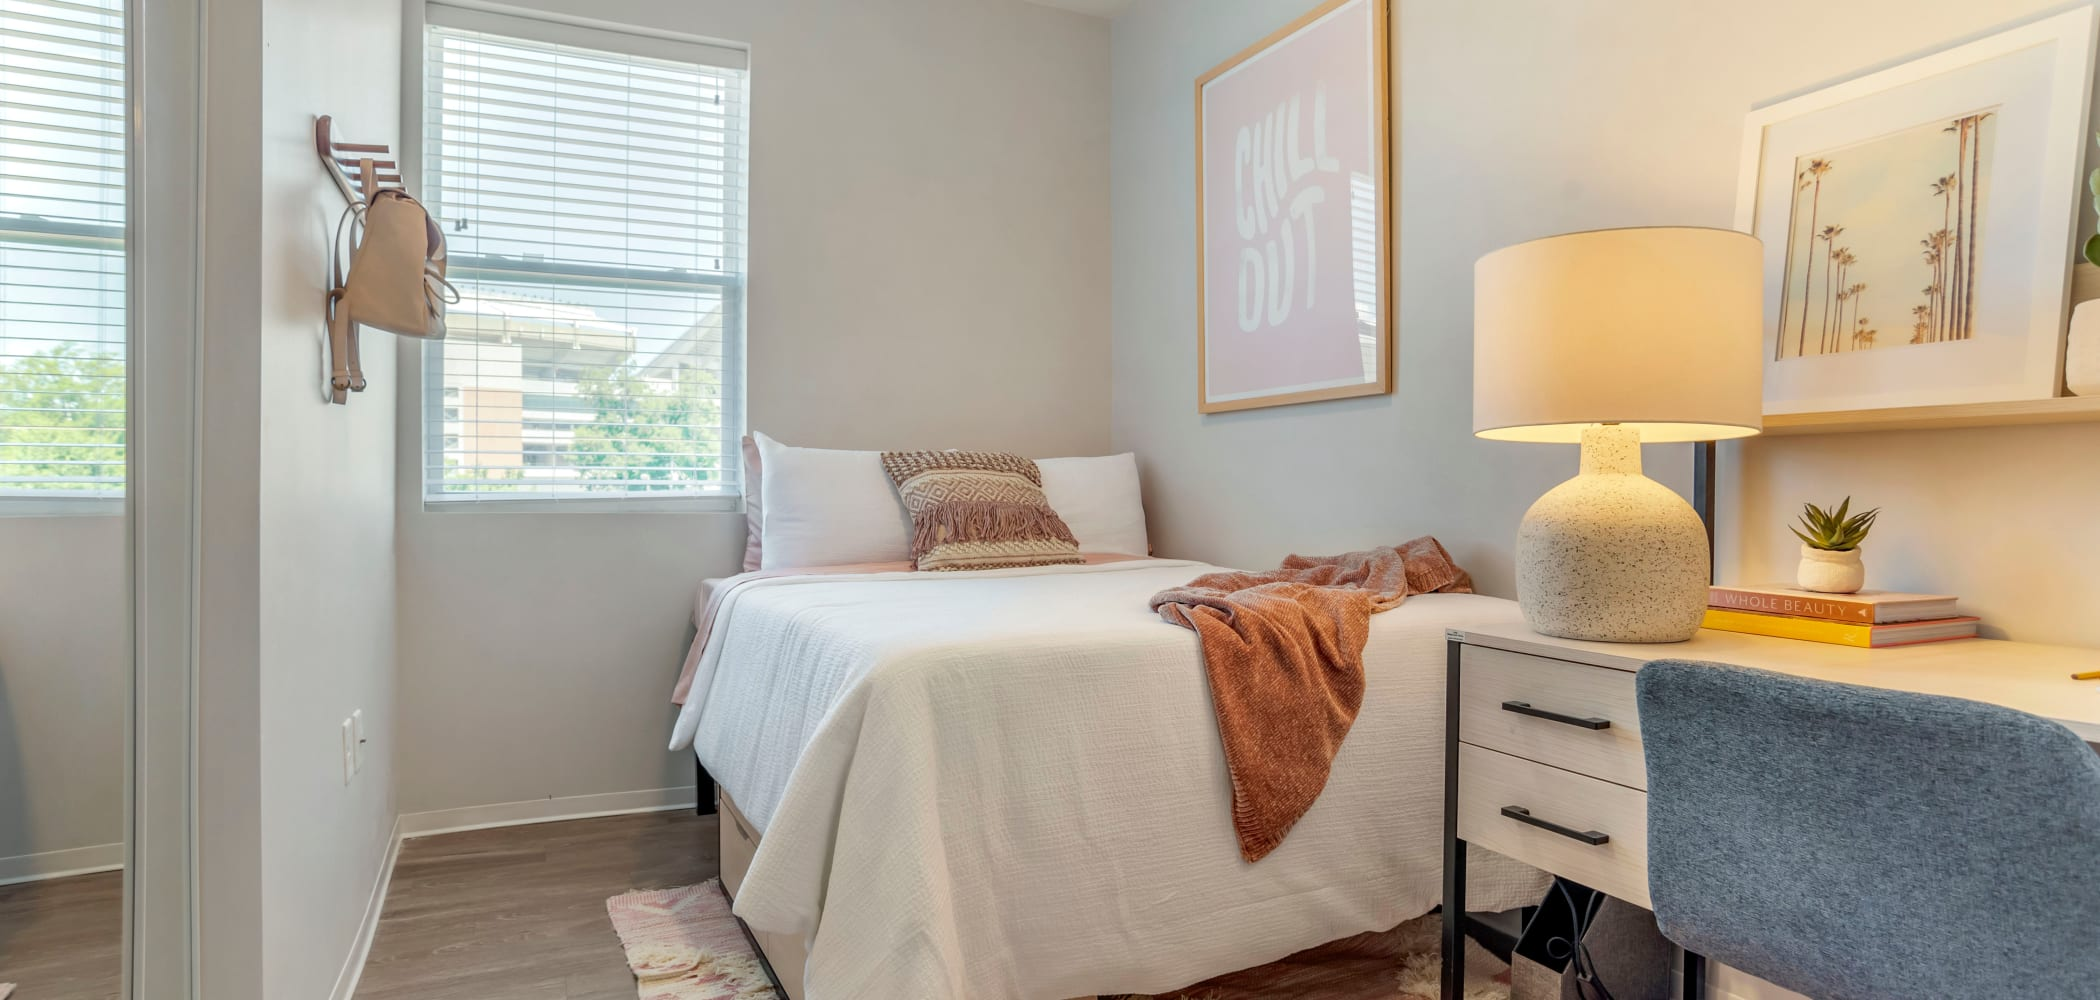 Spacious bedroom UNCOMMON Tuscaloosa in Tuscaloosa, Alabama